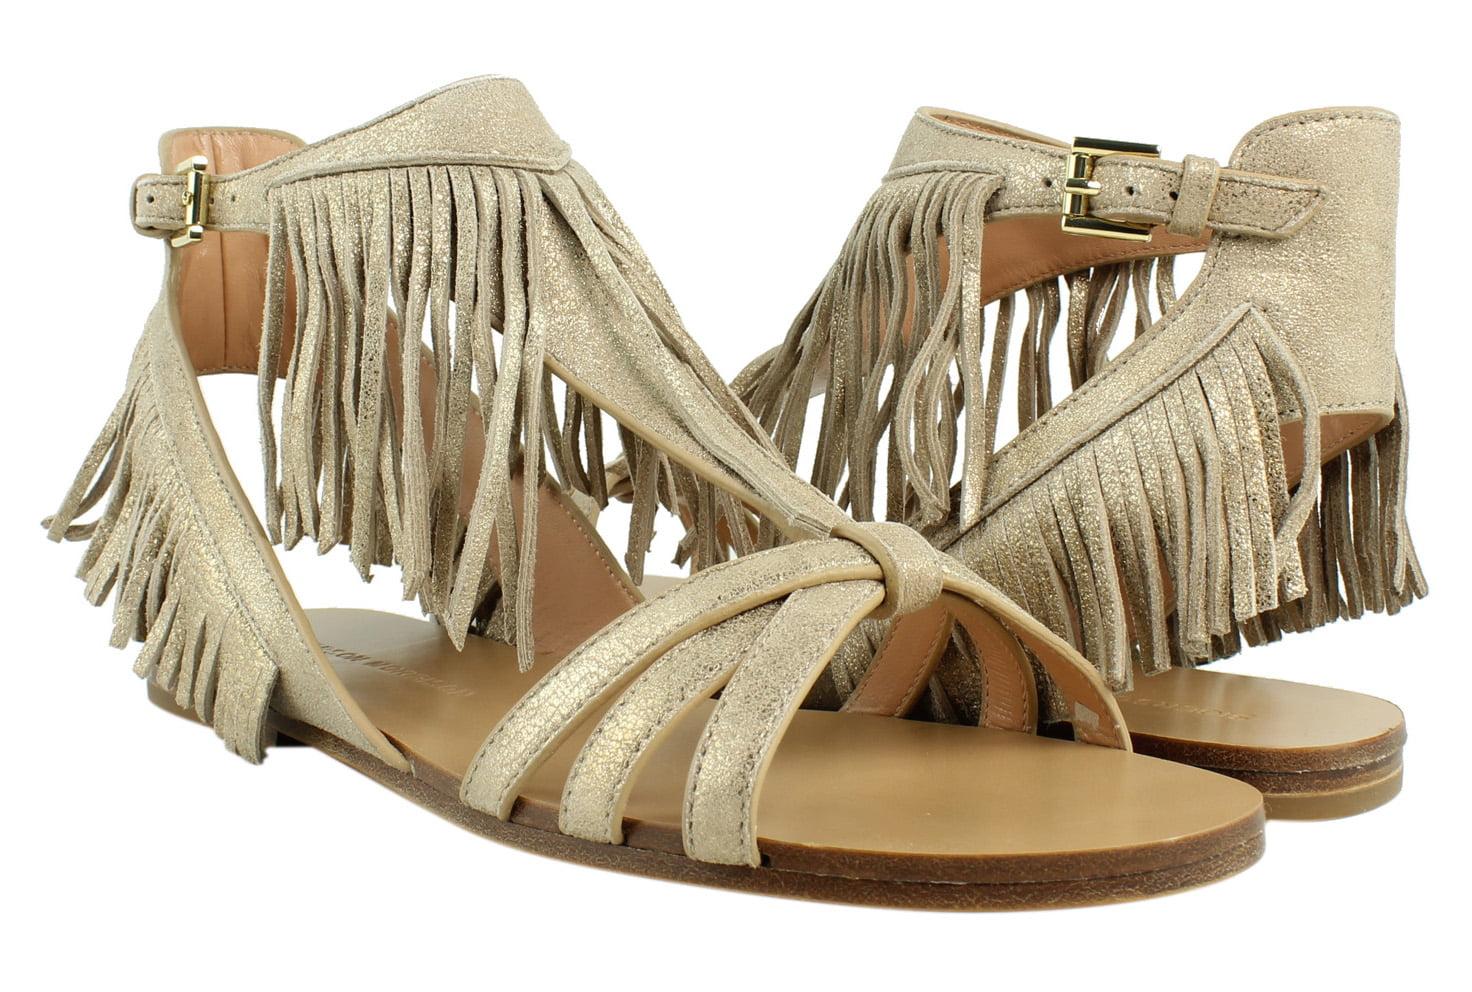 New Sigerson T-Strap Morrison Womens Bross LightGold T-Strap Sigerson Sandals Size 7.5 b6f4e3